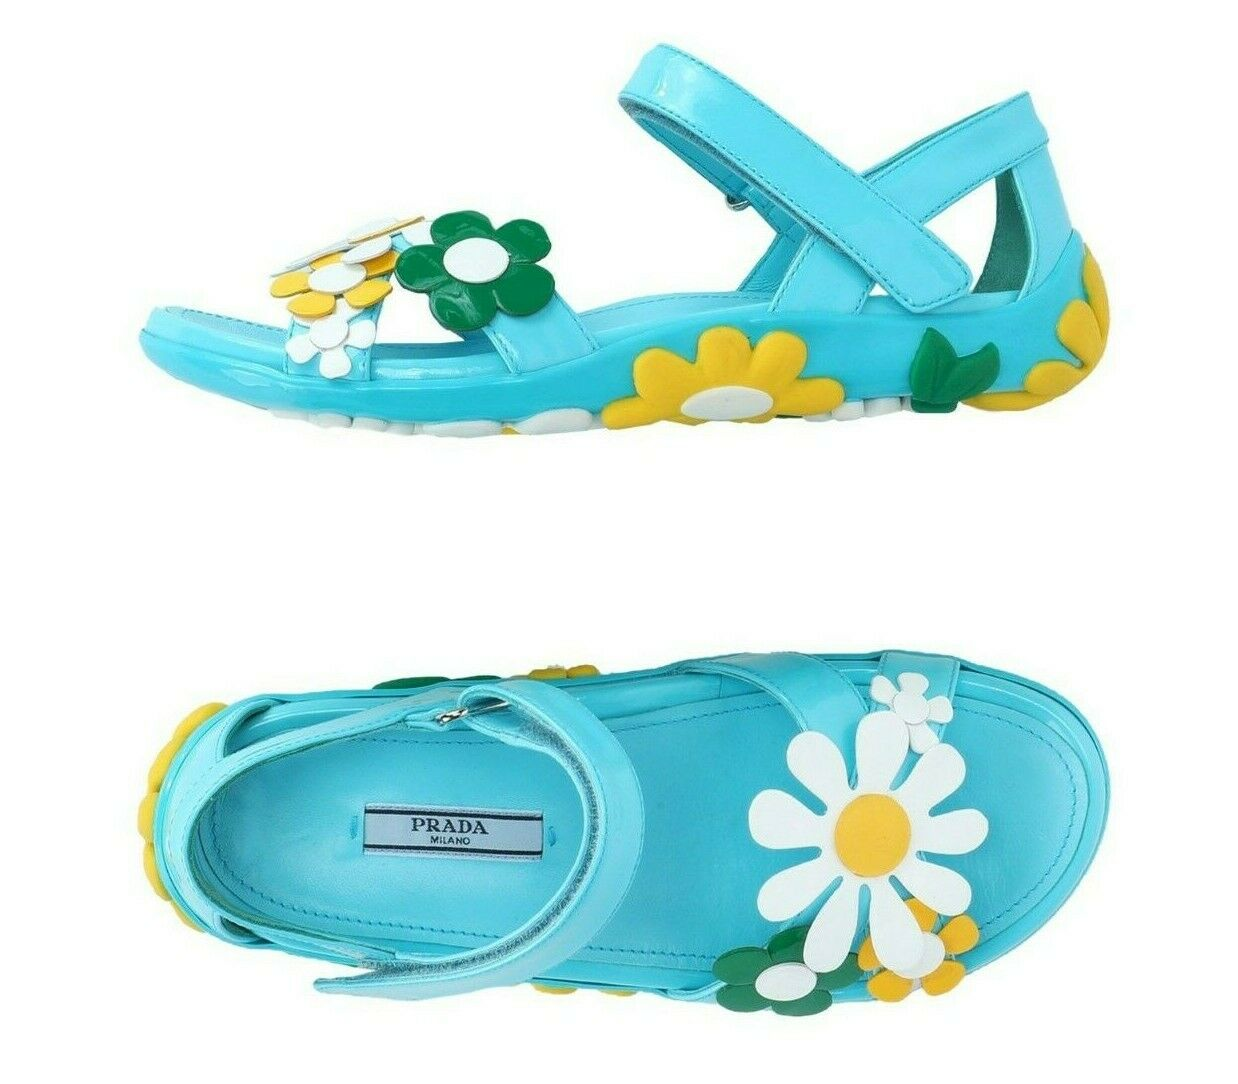 Prada pour femme Bleu Azur Azur Azur En Cuir Fleur Sandales Chaussures 39 9 NEW IN BOX 623cde